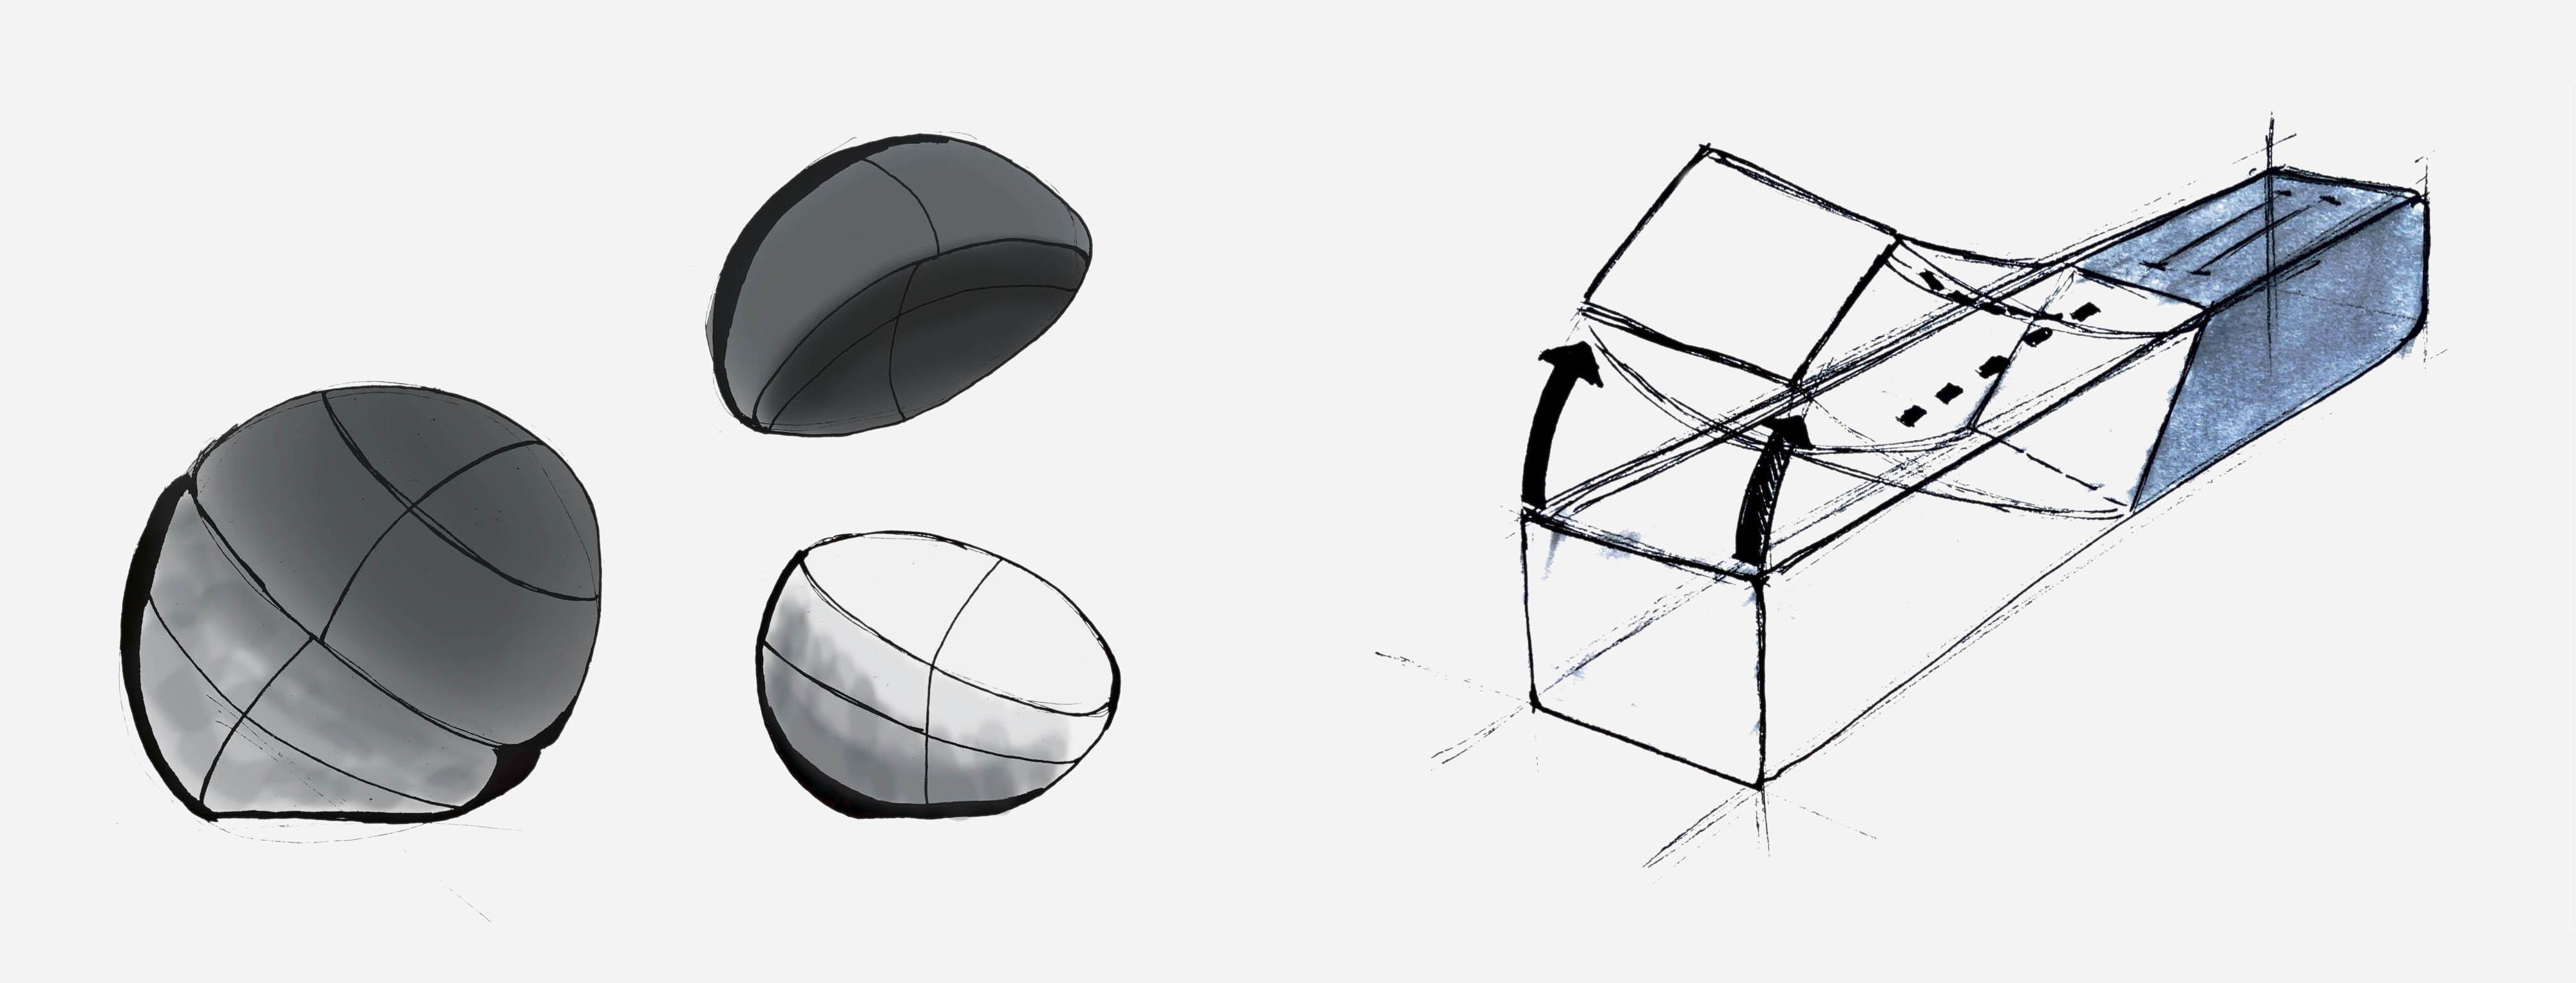 Circular Instrument, with 2 hemispheres separating'